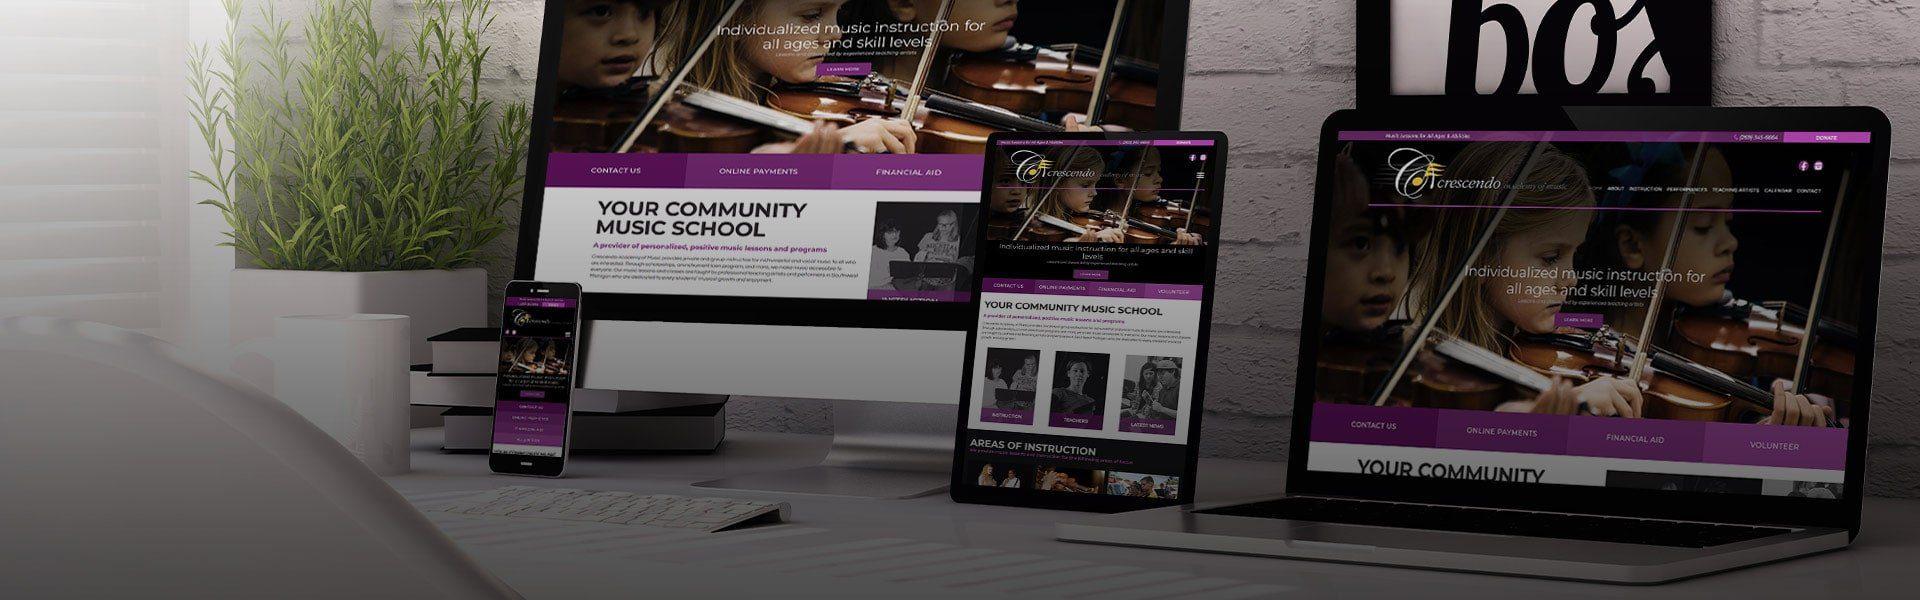 Web Design Kzoo